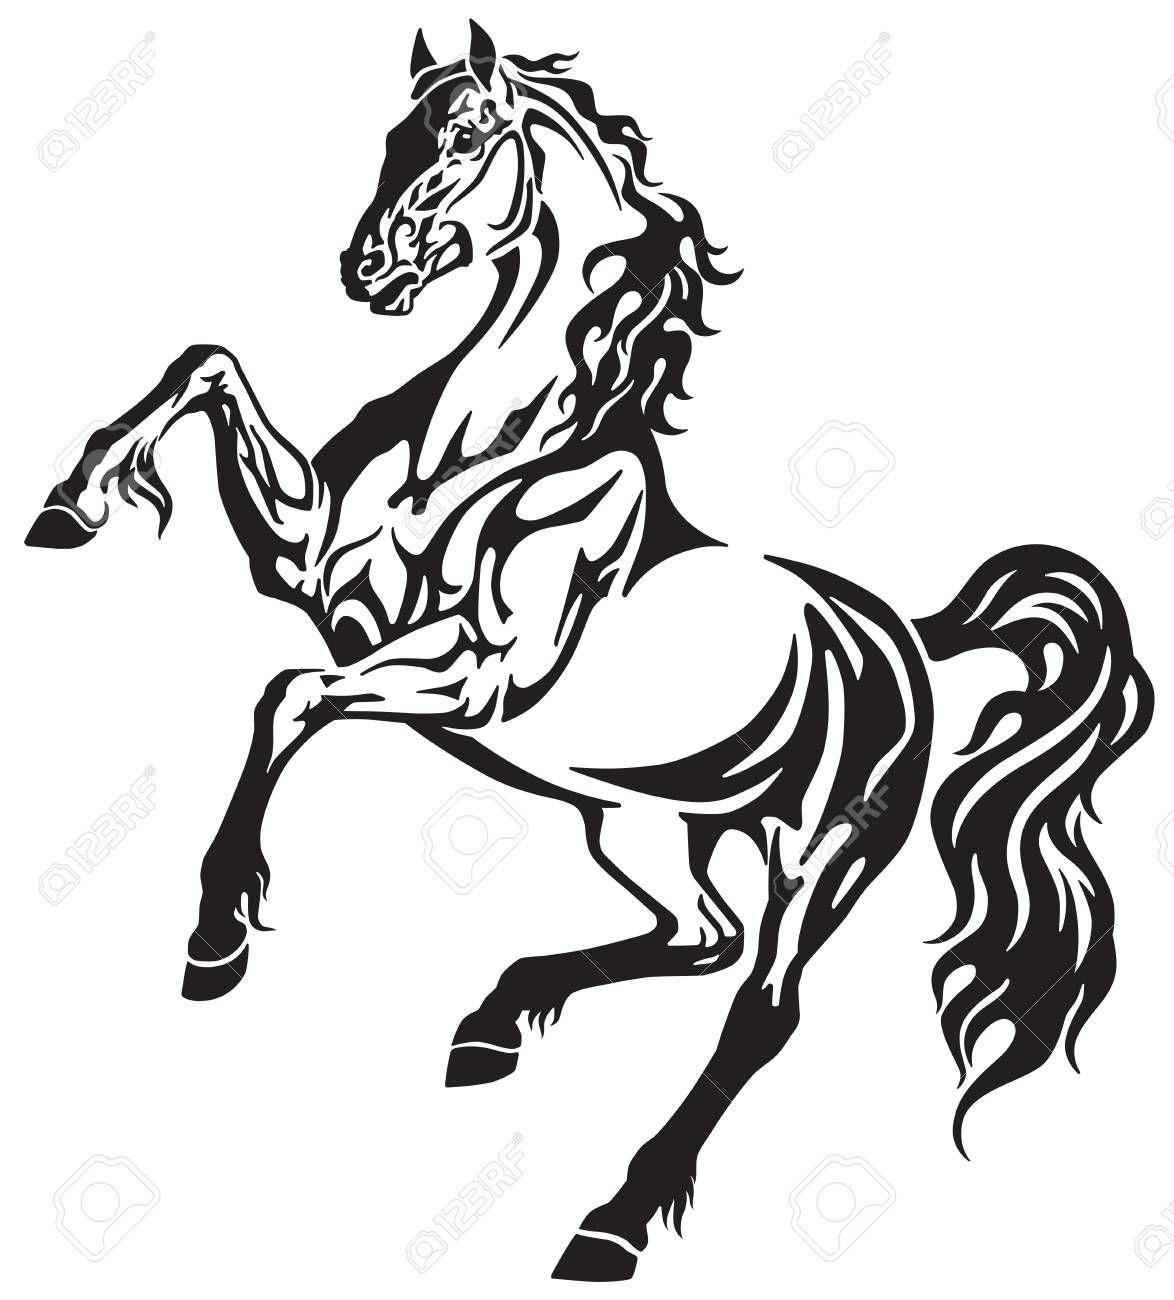 The Horse Stallion In The Rearing Free Movement Elegant Tribal Stallion Tattoo Horse Tattoo Tattoo Style